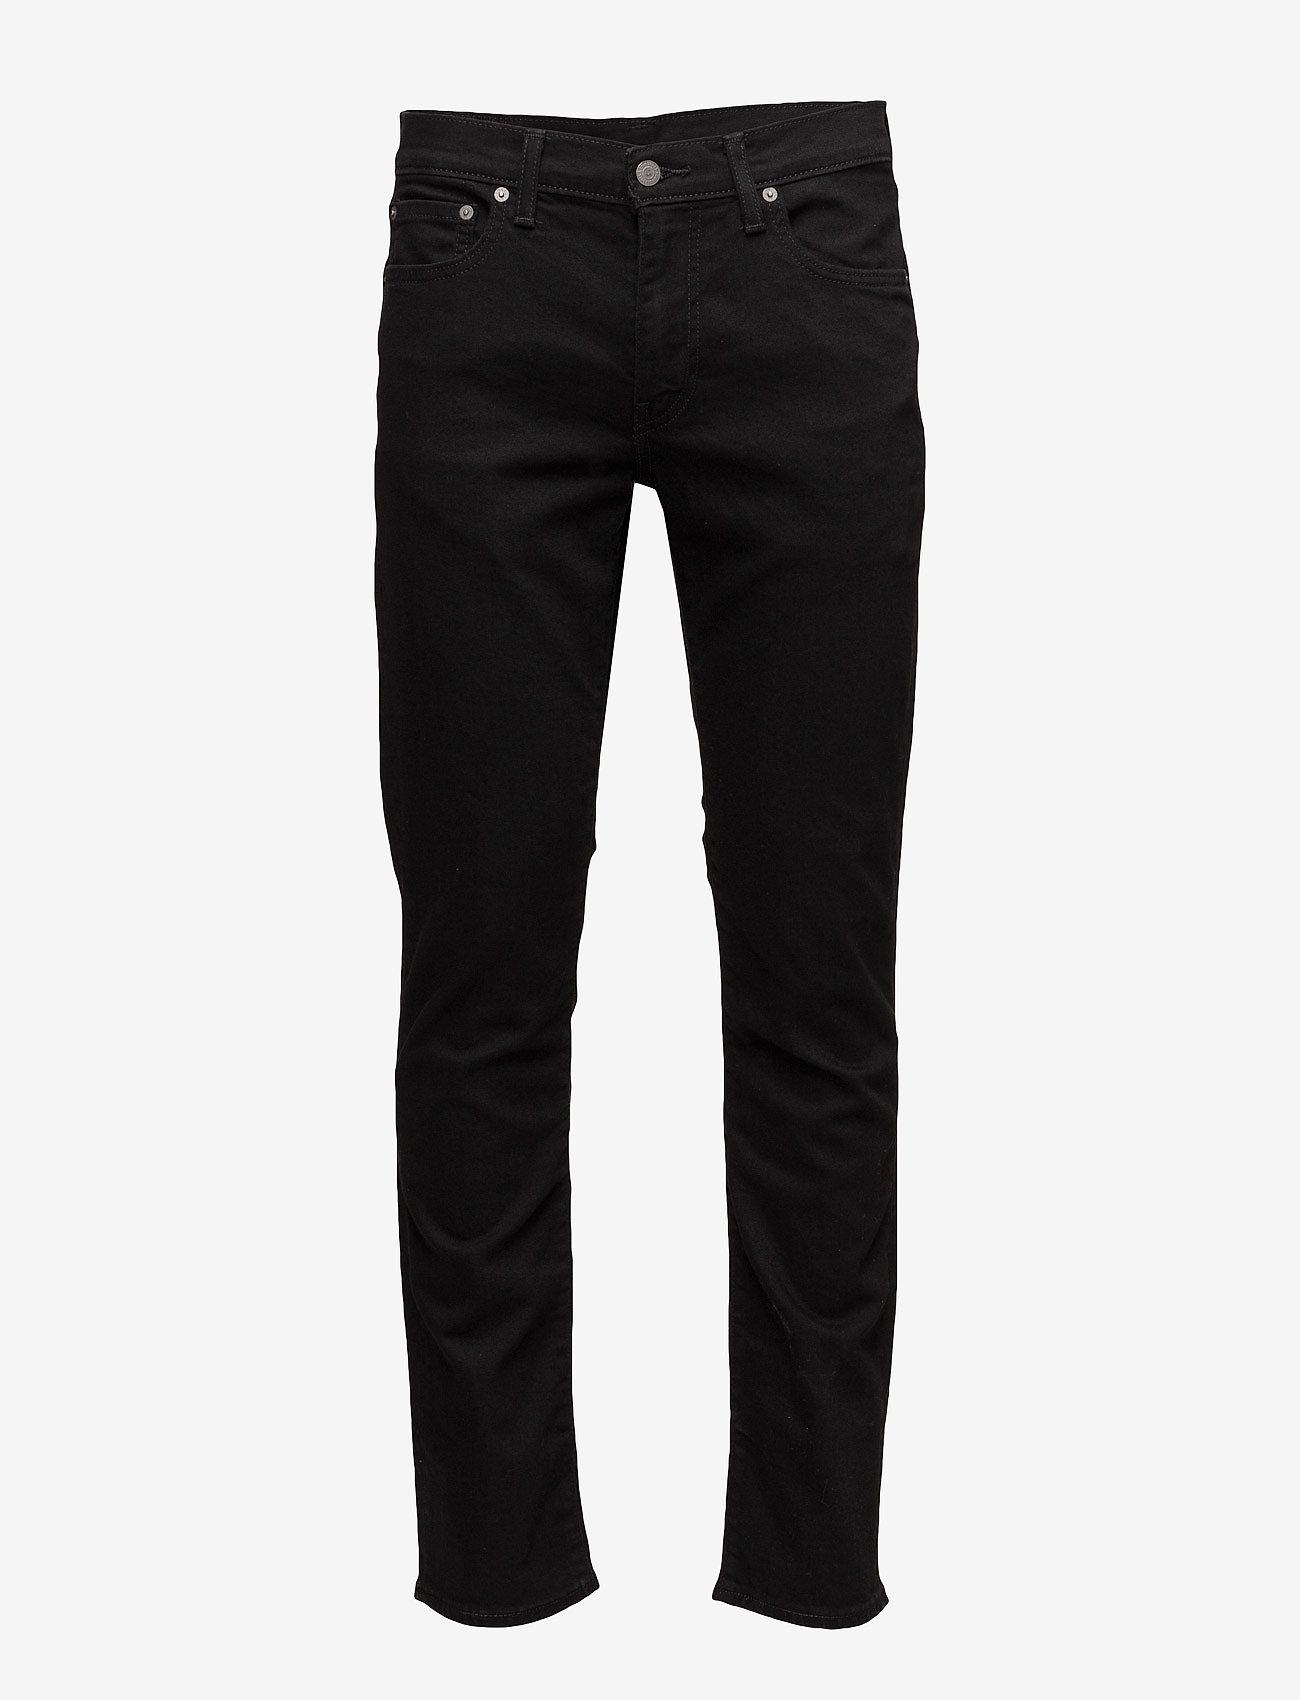 LEVI´S Men - 511 SLIM NIGHTSHINE - slim jeans - blacks - 0